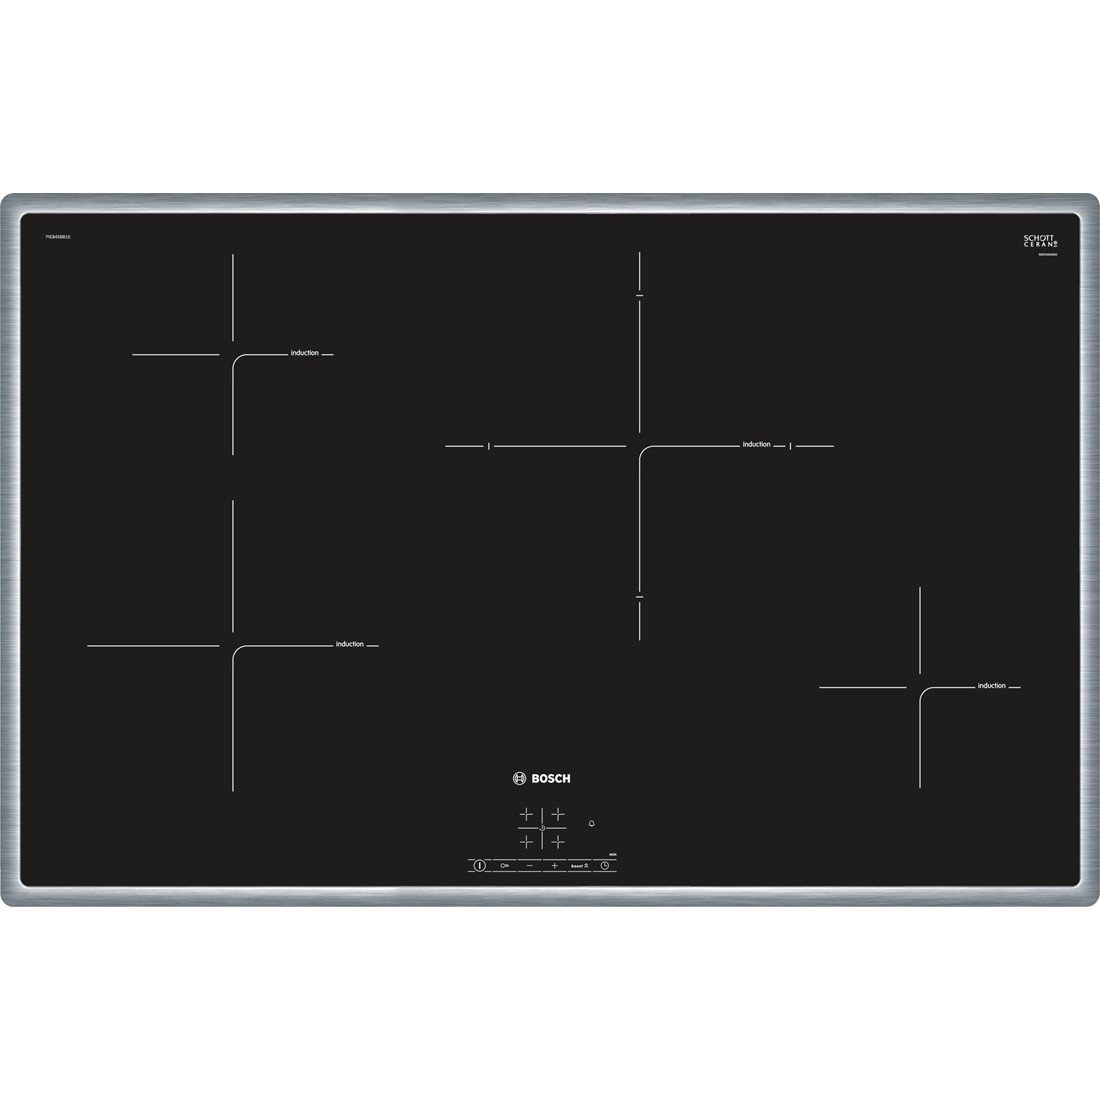 Bosch PIE845BB1E Kitchen Cooktop